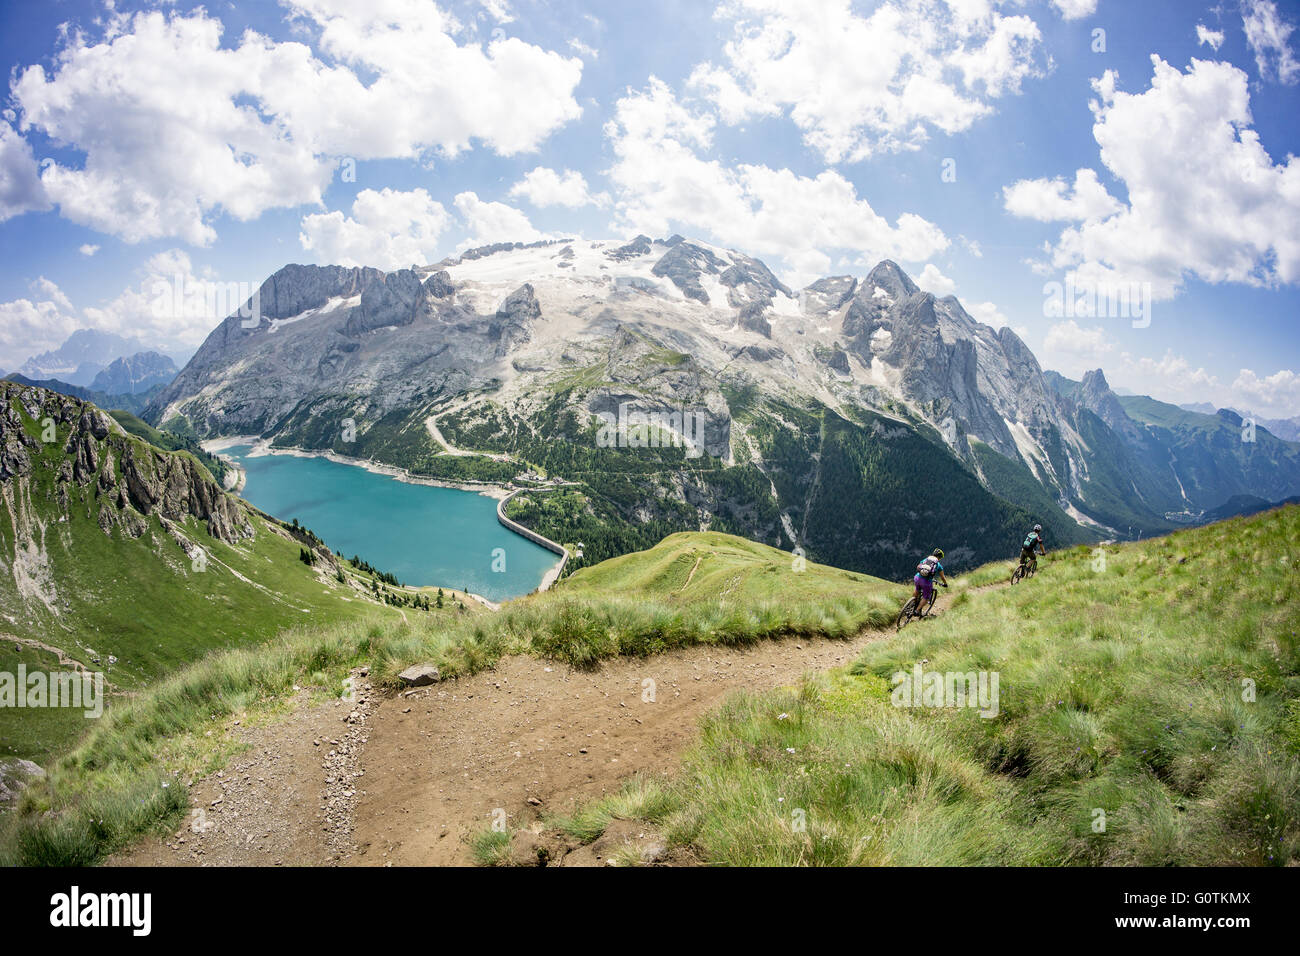 Man and woman riding mountain bikes along trail, Dolomites, Italy Stock Photo